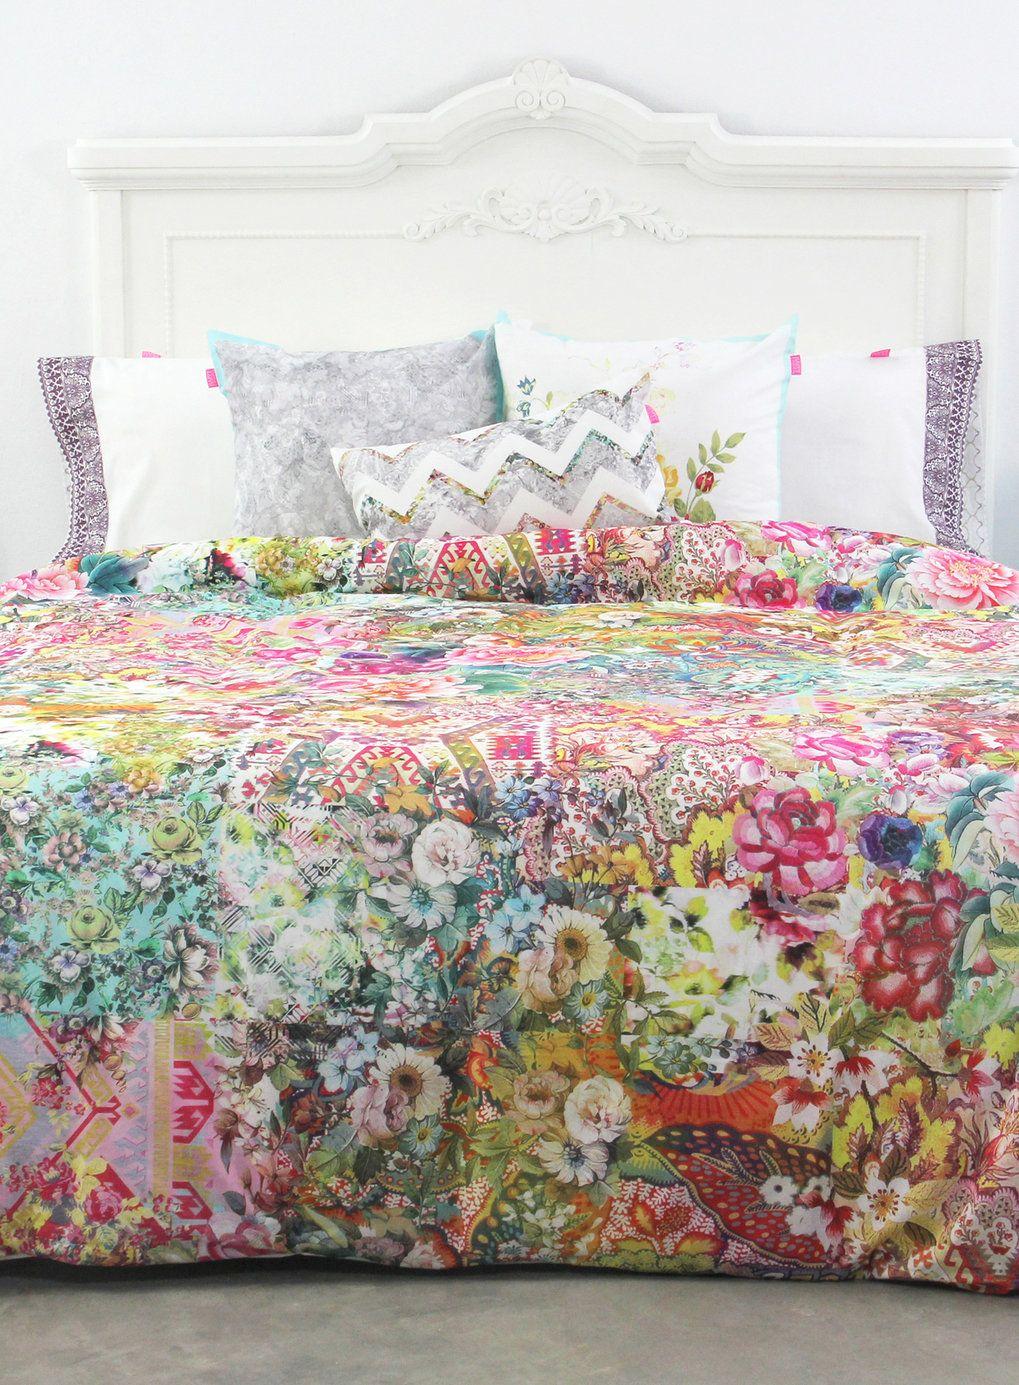 Bohemian Chic Bedding happy friday boho chic bedding set - bhs | london flat | pinterest